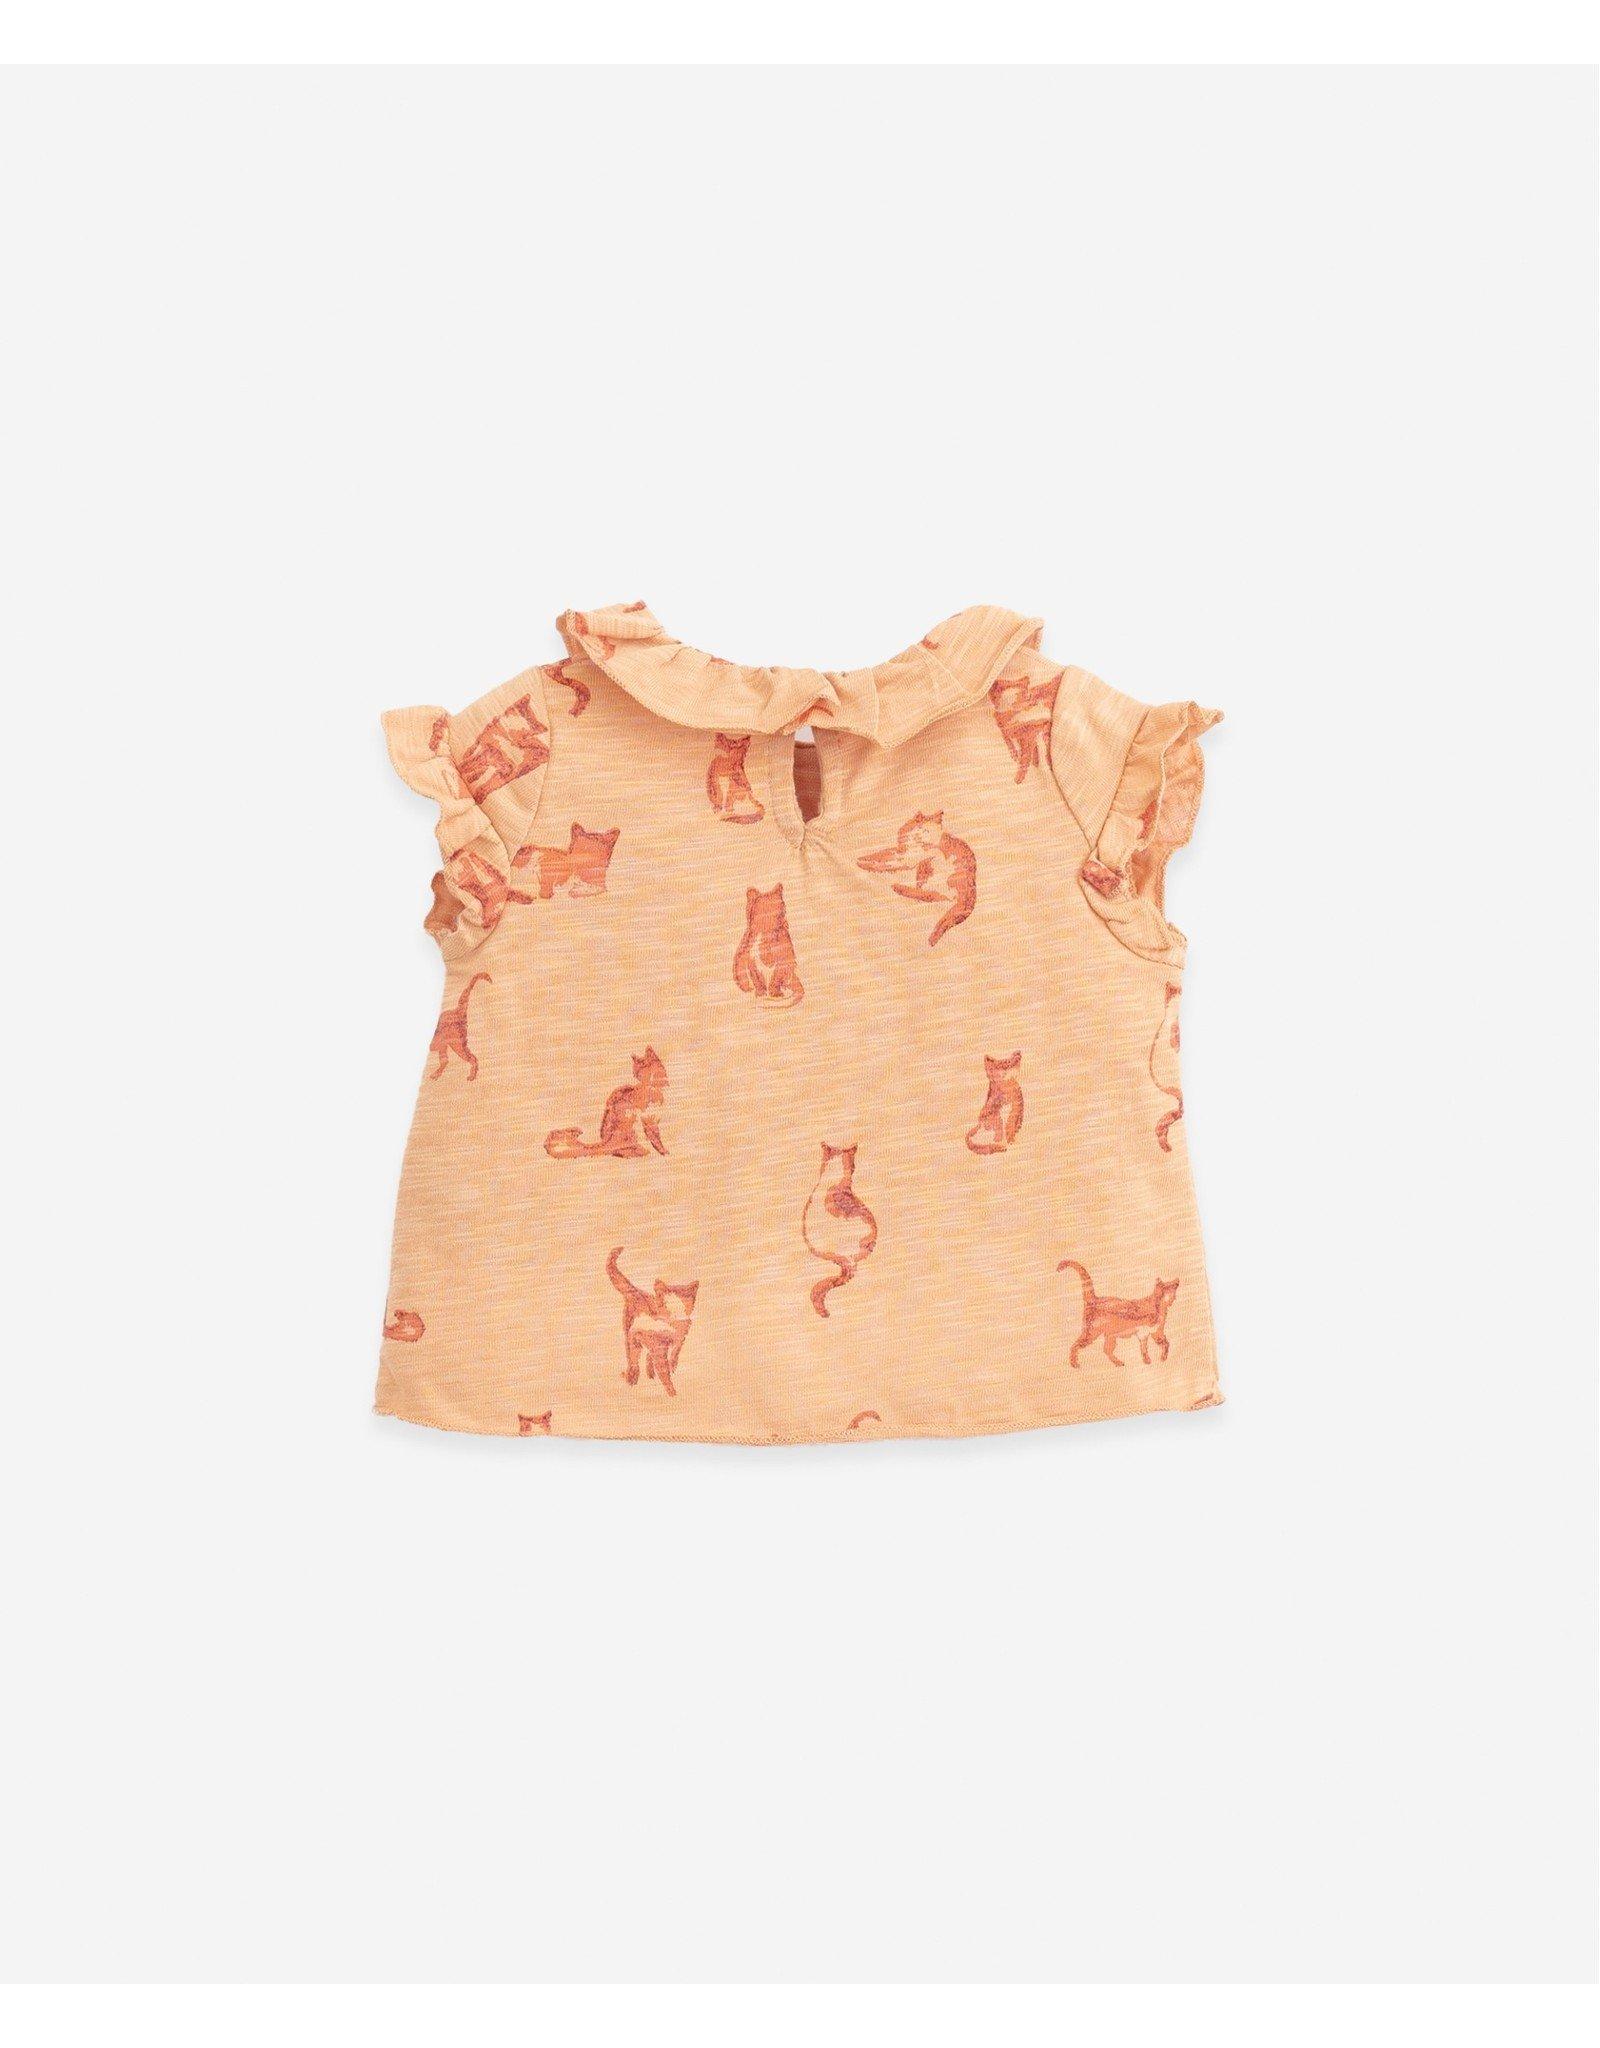 Play Up Play Up T-shirt With Cats Print Teresa